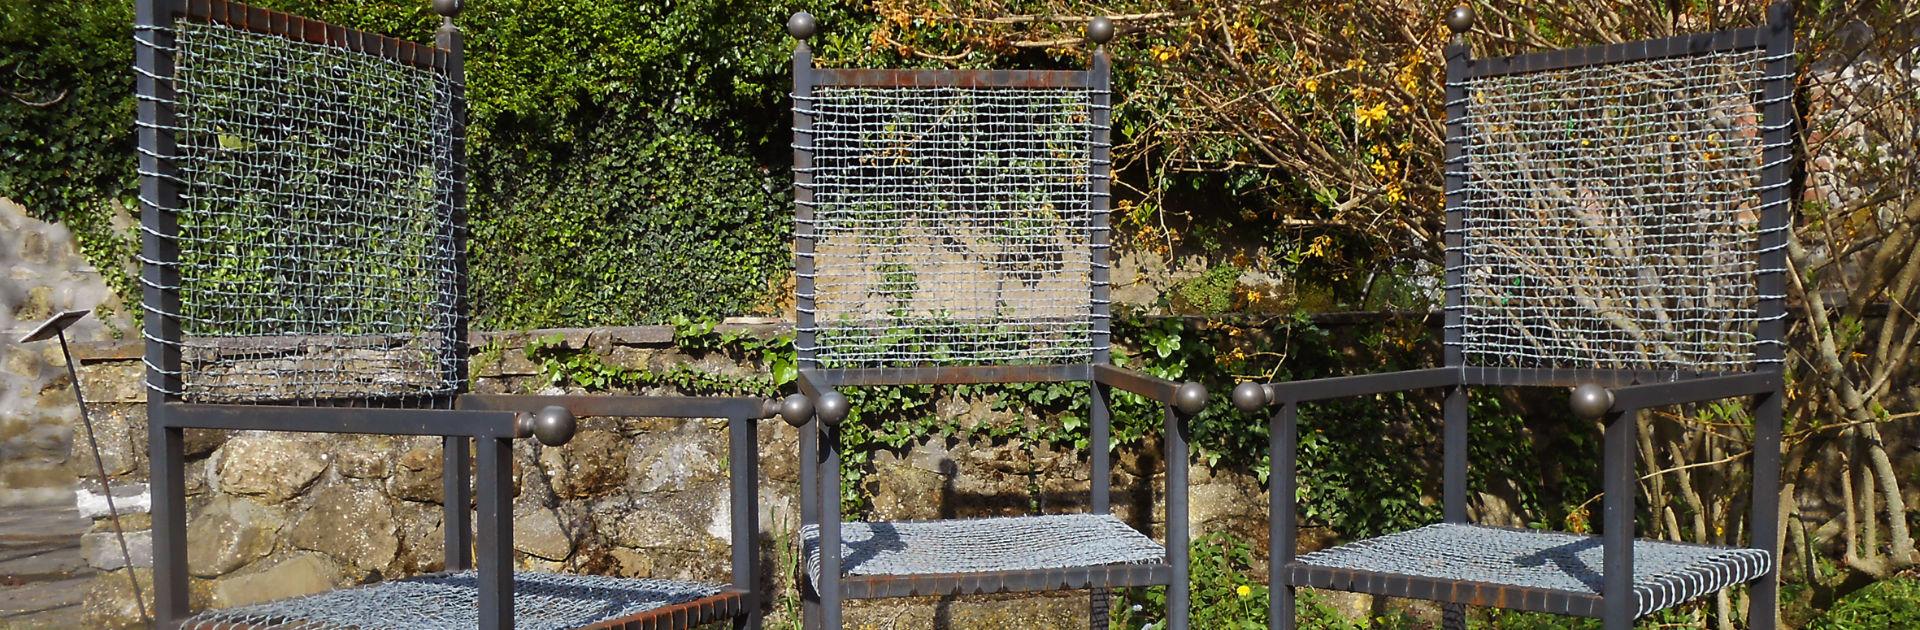 Künstler Luciano Ghersi im Giardino di Daniel Spoerri